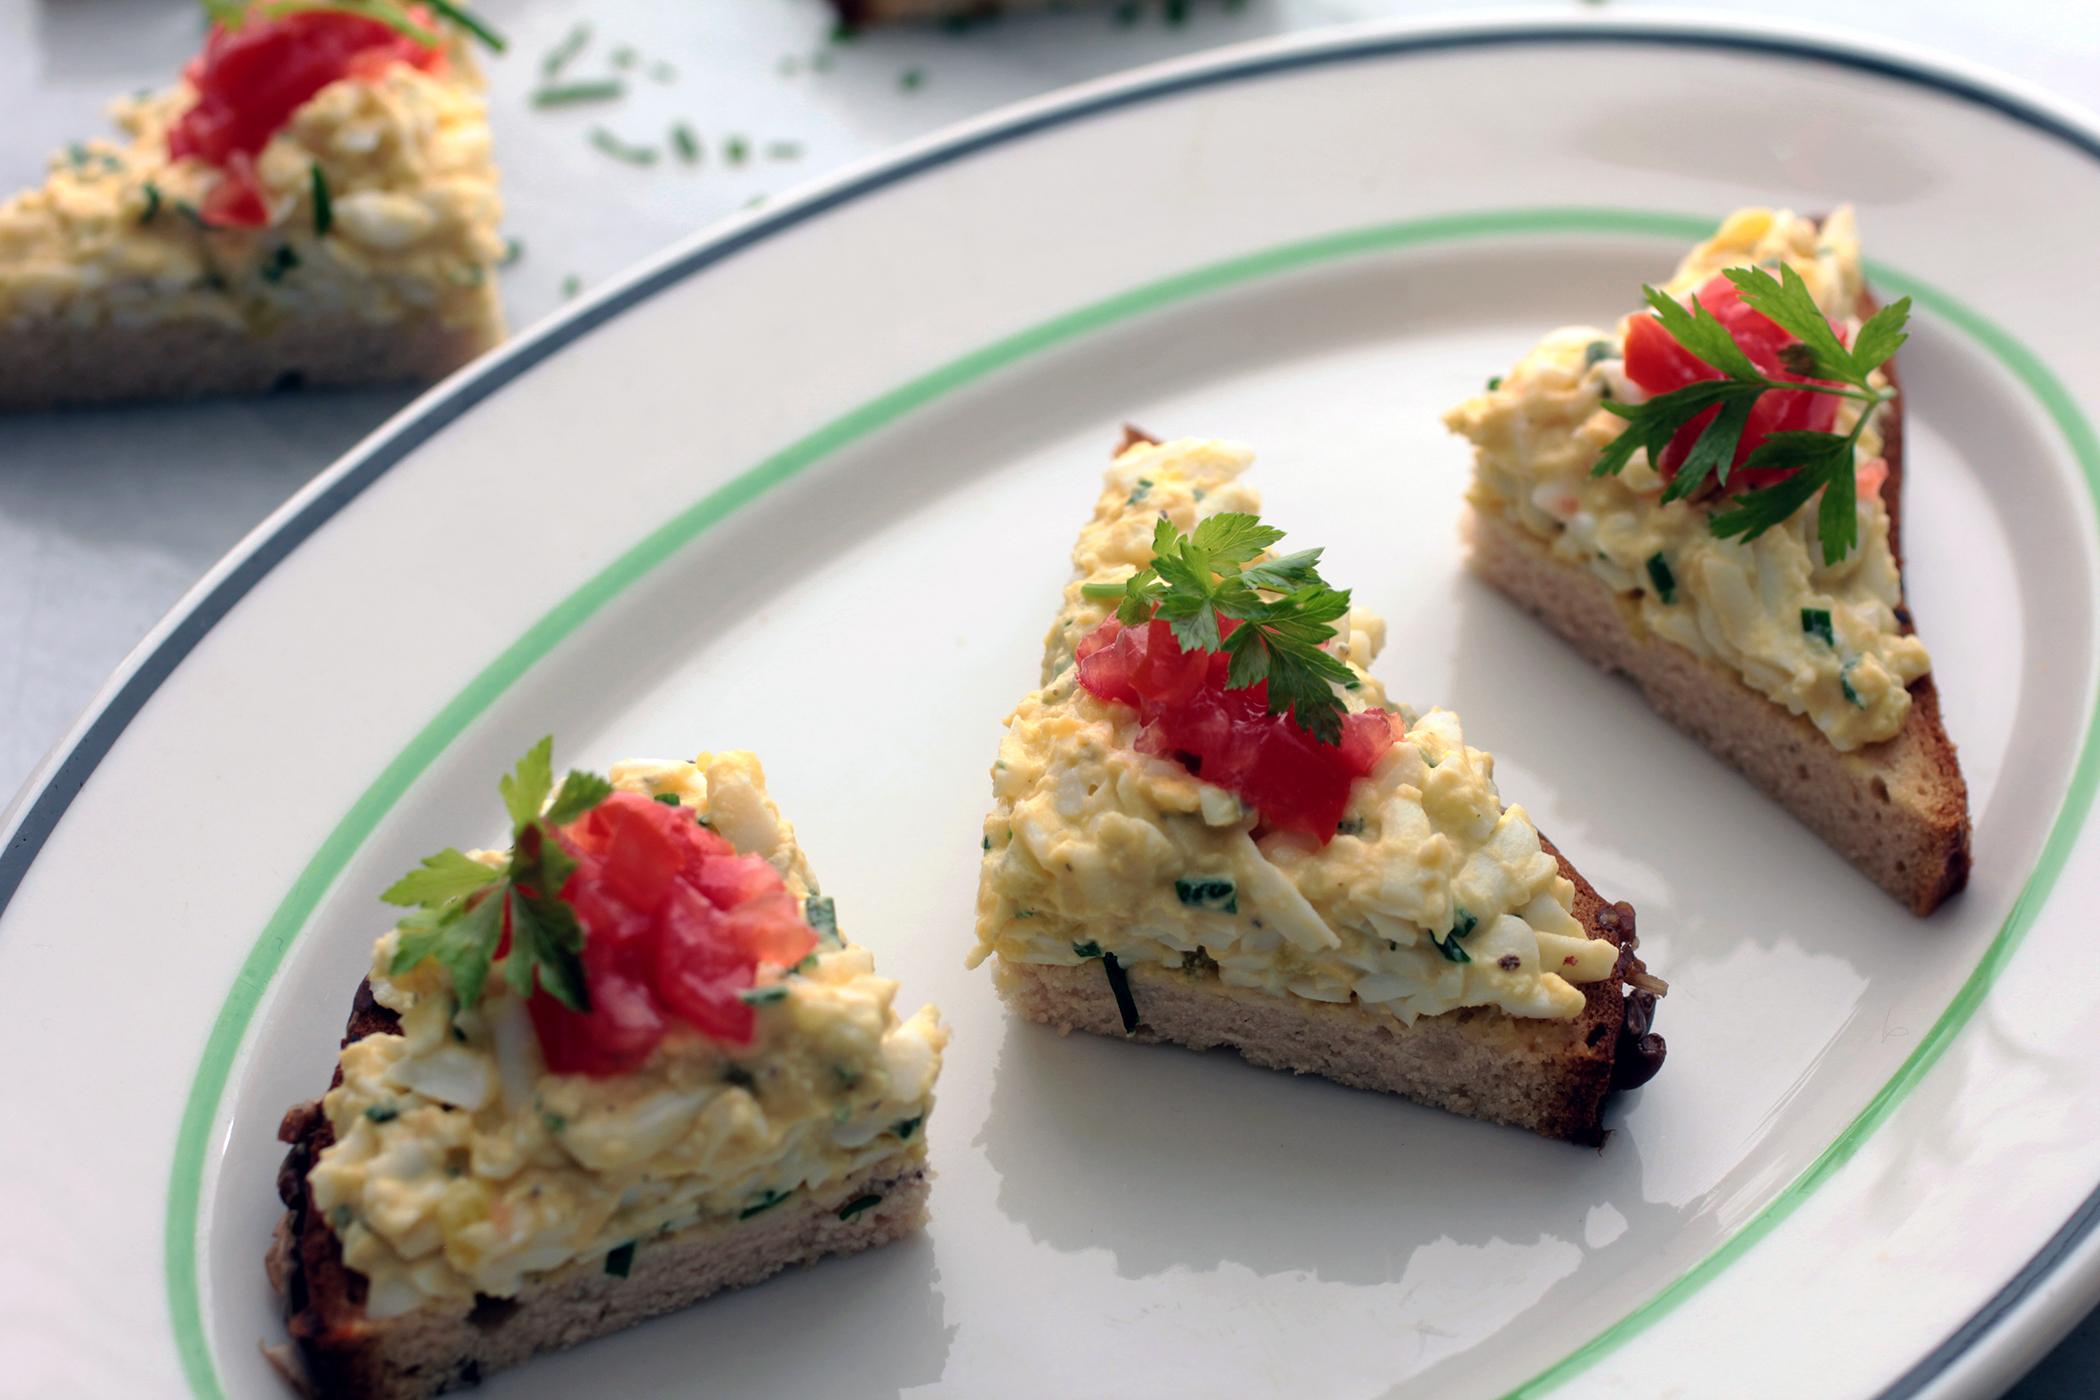 sabra_egg_salad_3